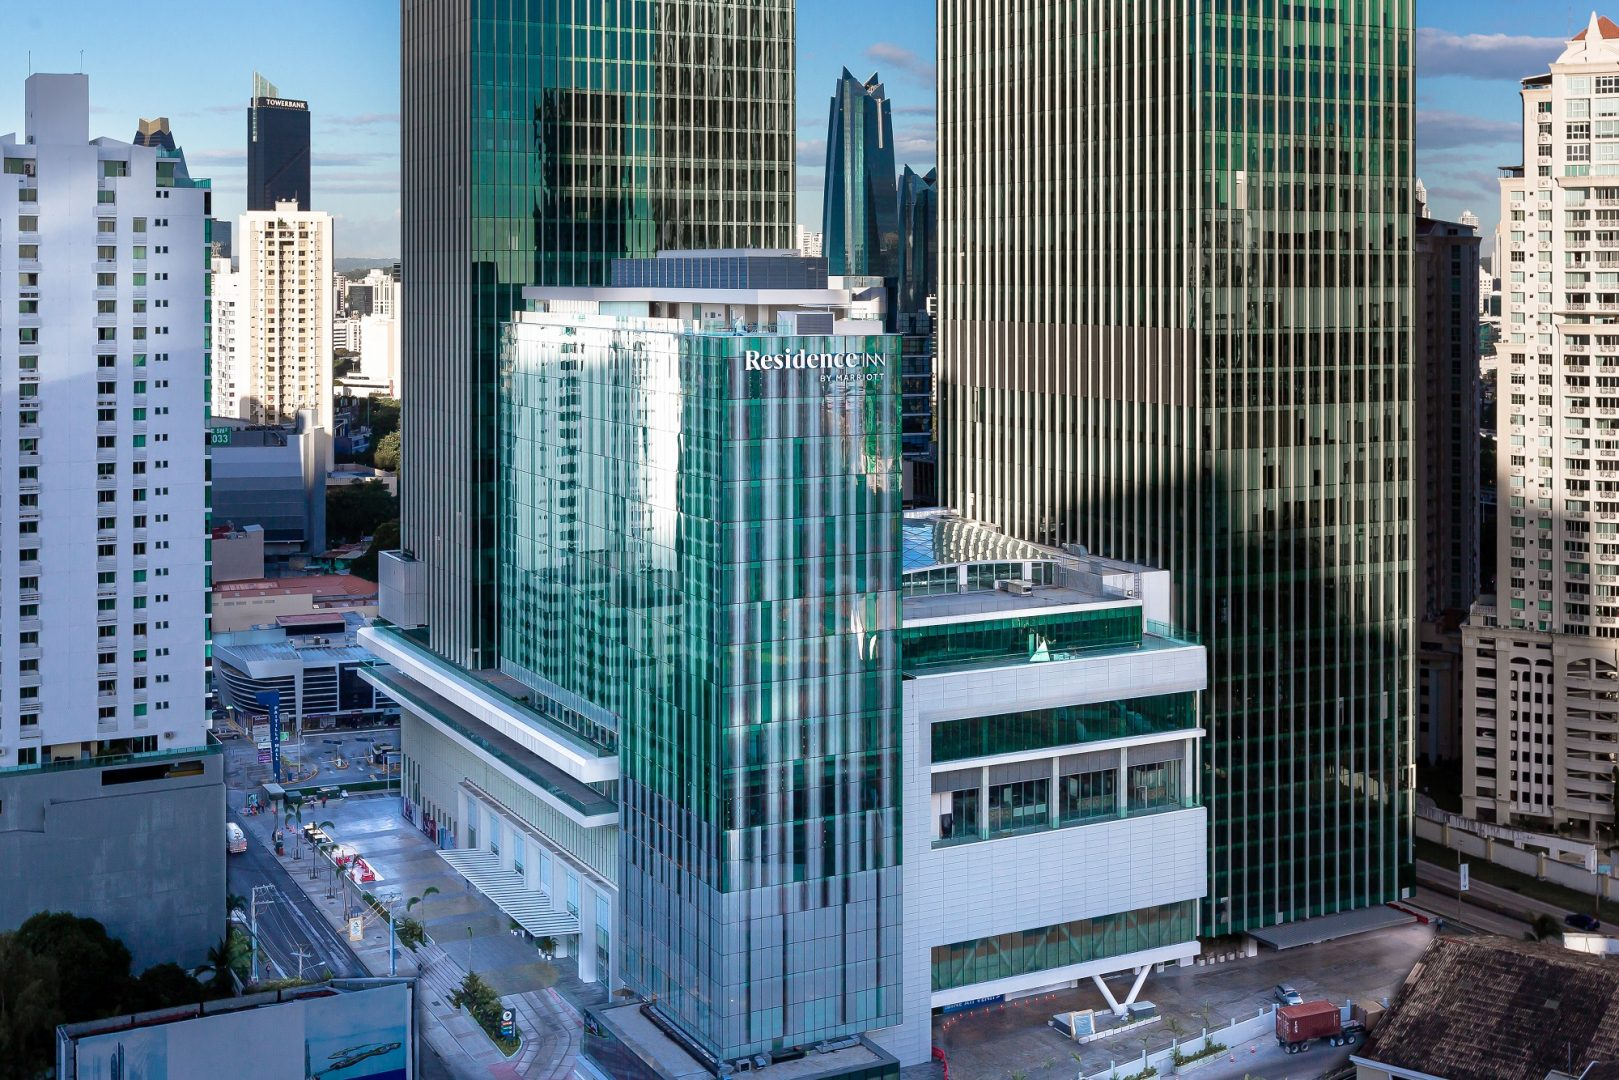 Residence Inn Panama City